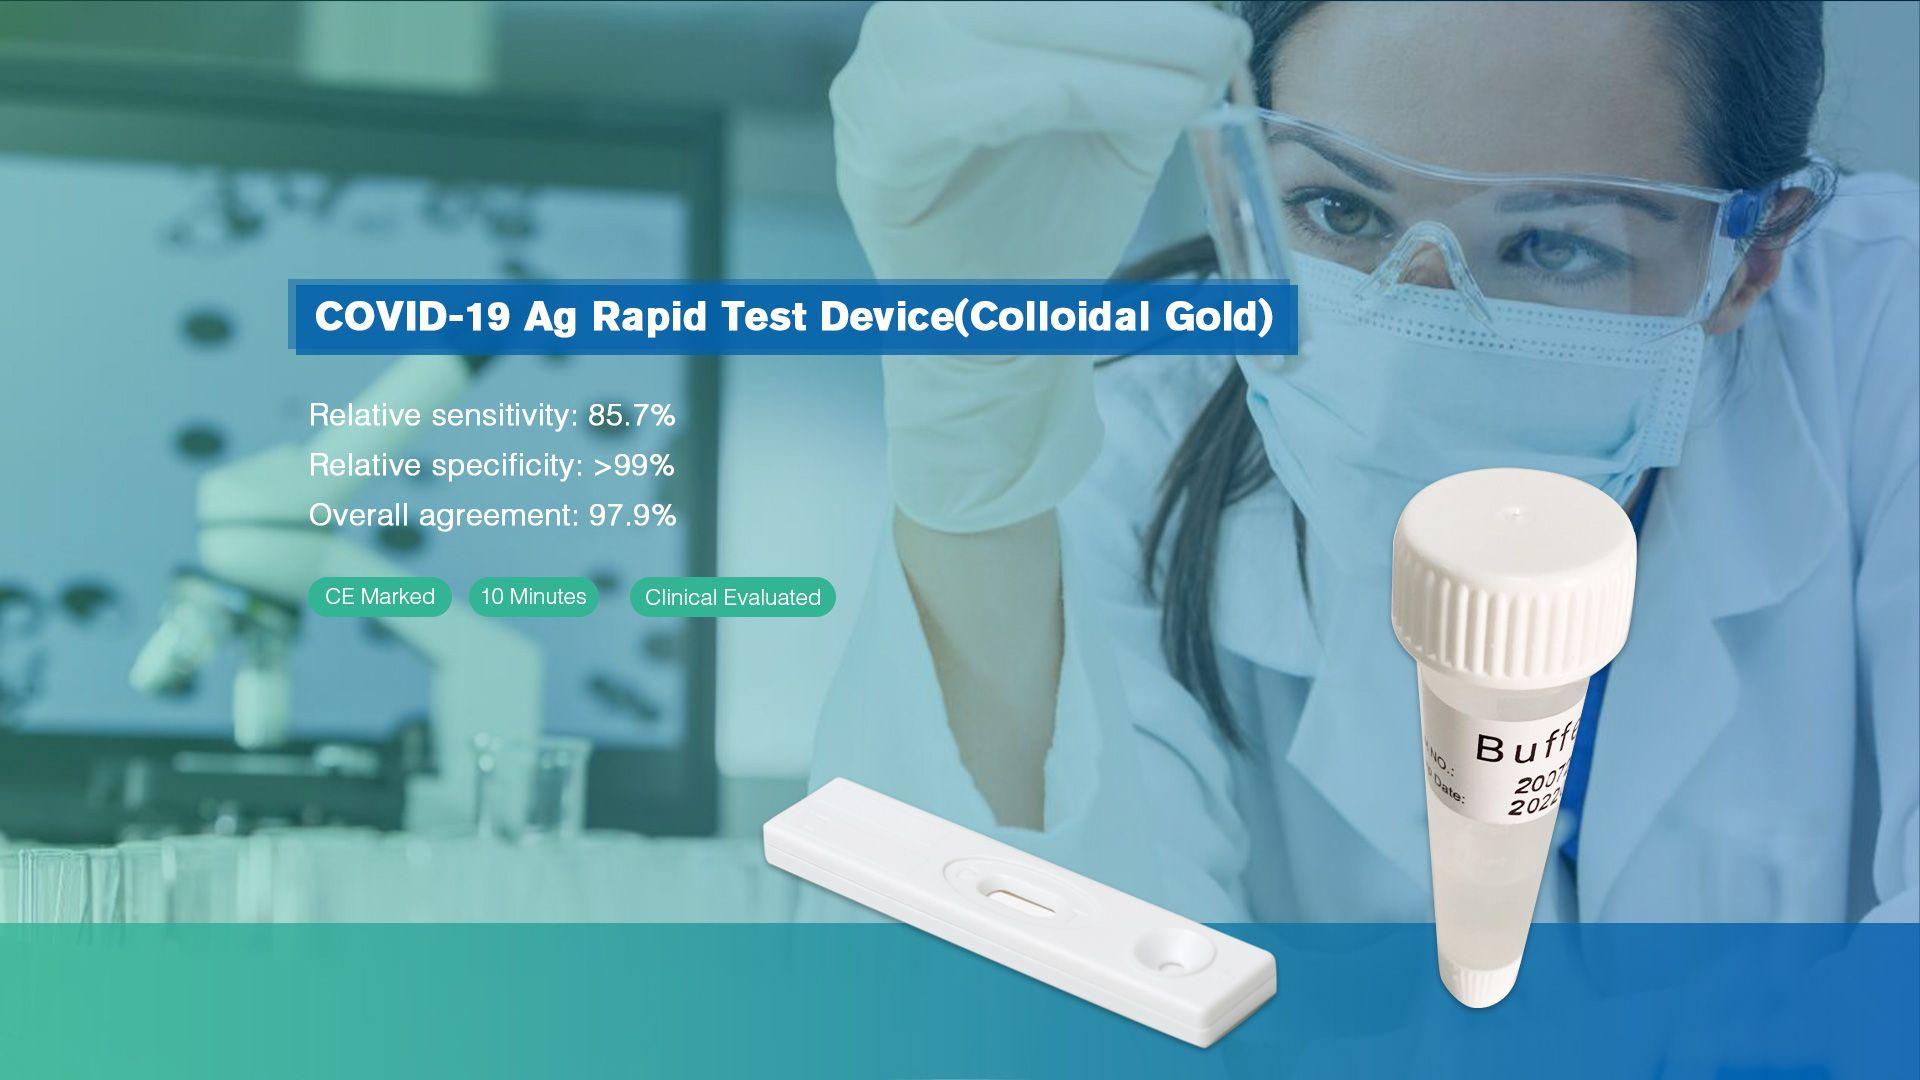 COVID-19-Ag Rapid Test Device